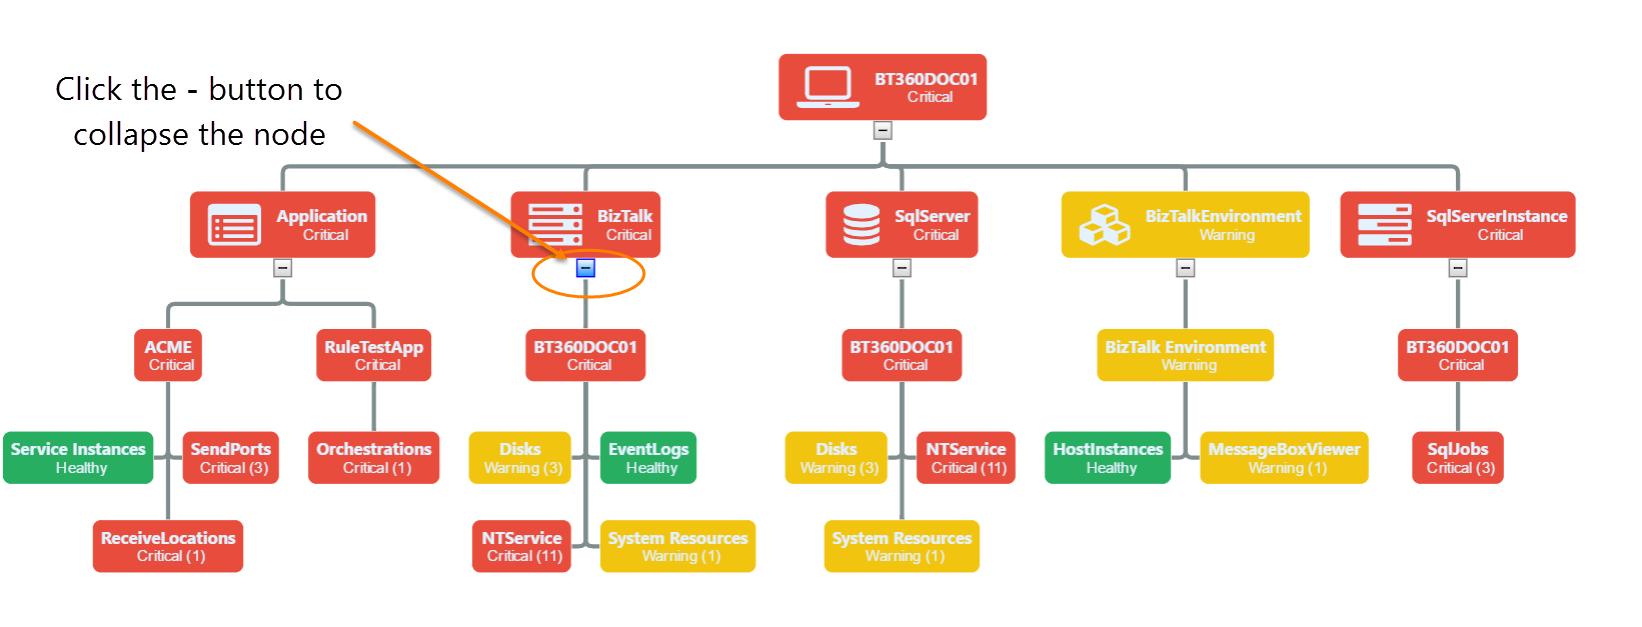 BizTalk360-Monitoring-Dashboard-Collapse-Nodes.png